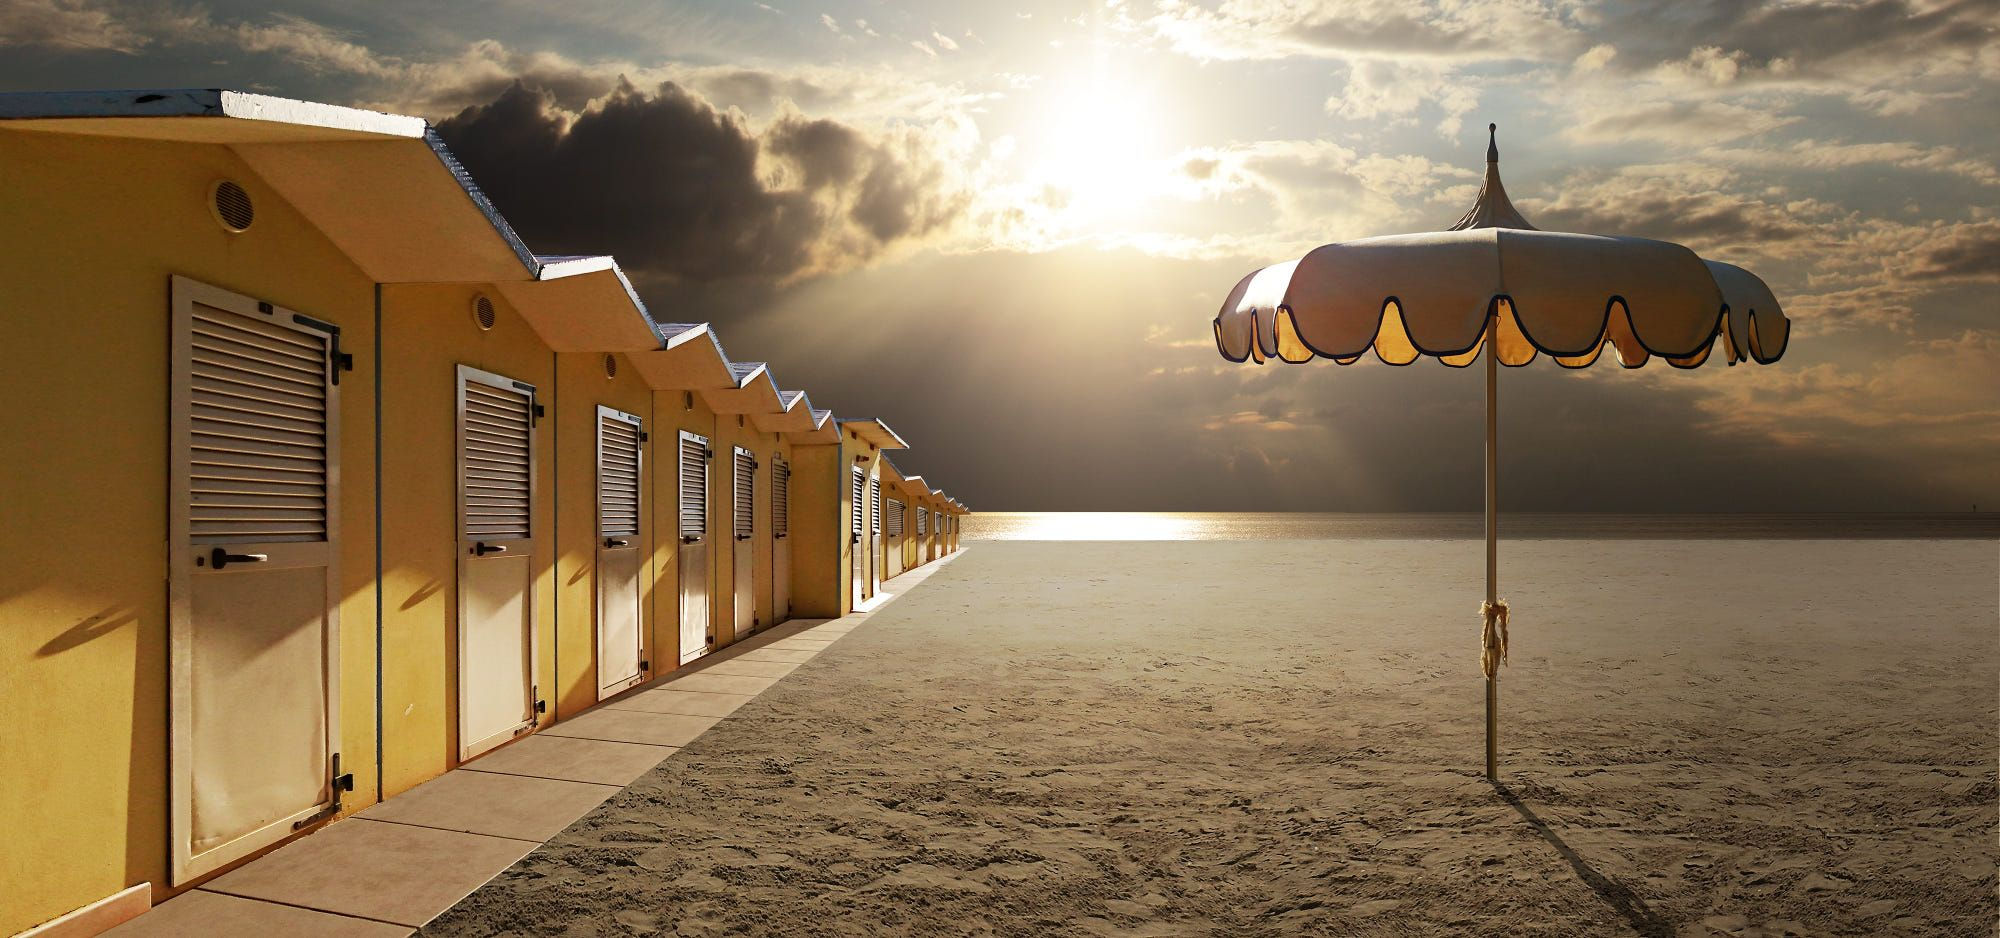 "Mañana volvemos a la playa, #fotografía de Anna Ovatta ⚡️ ""1 + 5 FOTOS FAVORITAS DE @HACERFOTOS (8/07/2017)"" https://twitter.com/i/moments/883541176275668992"